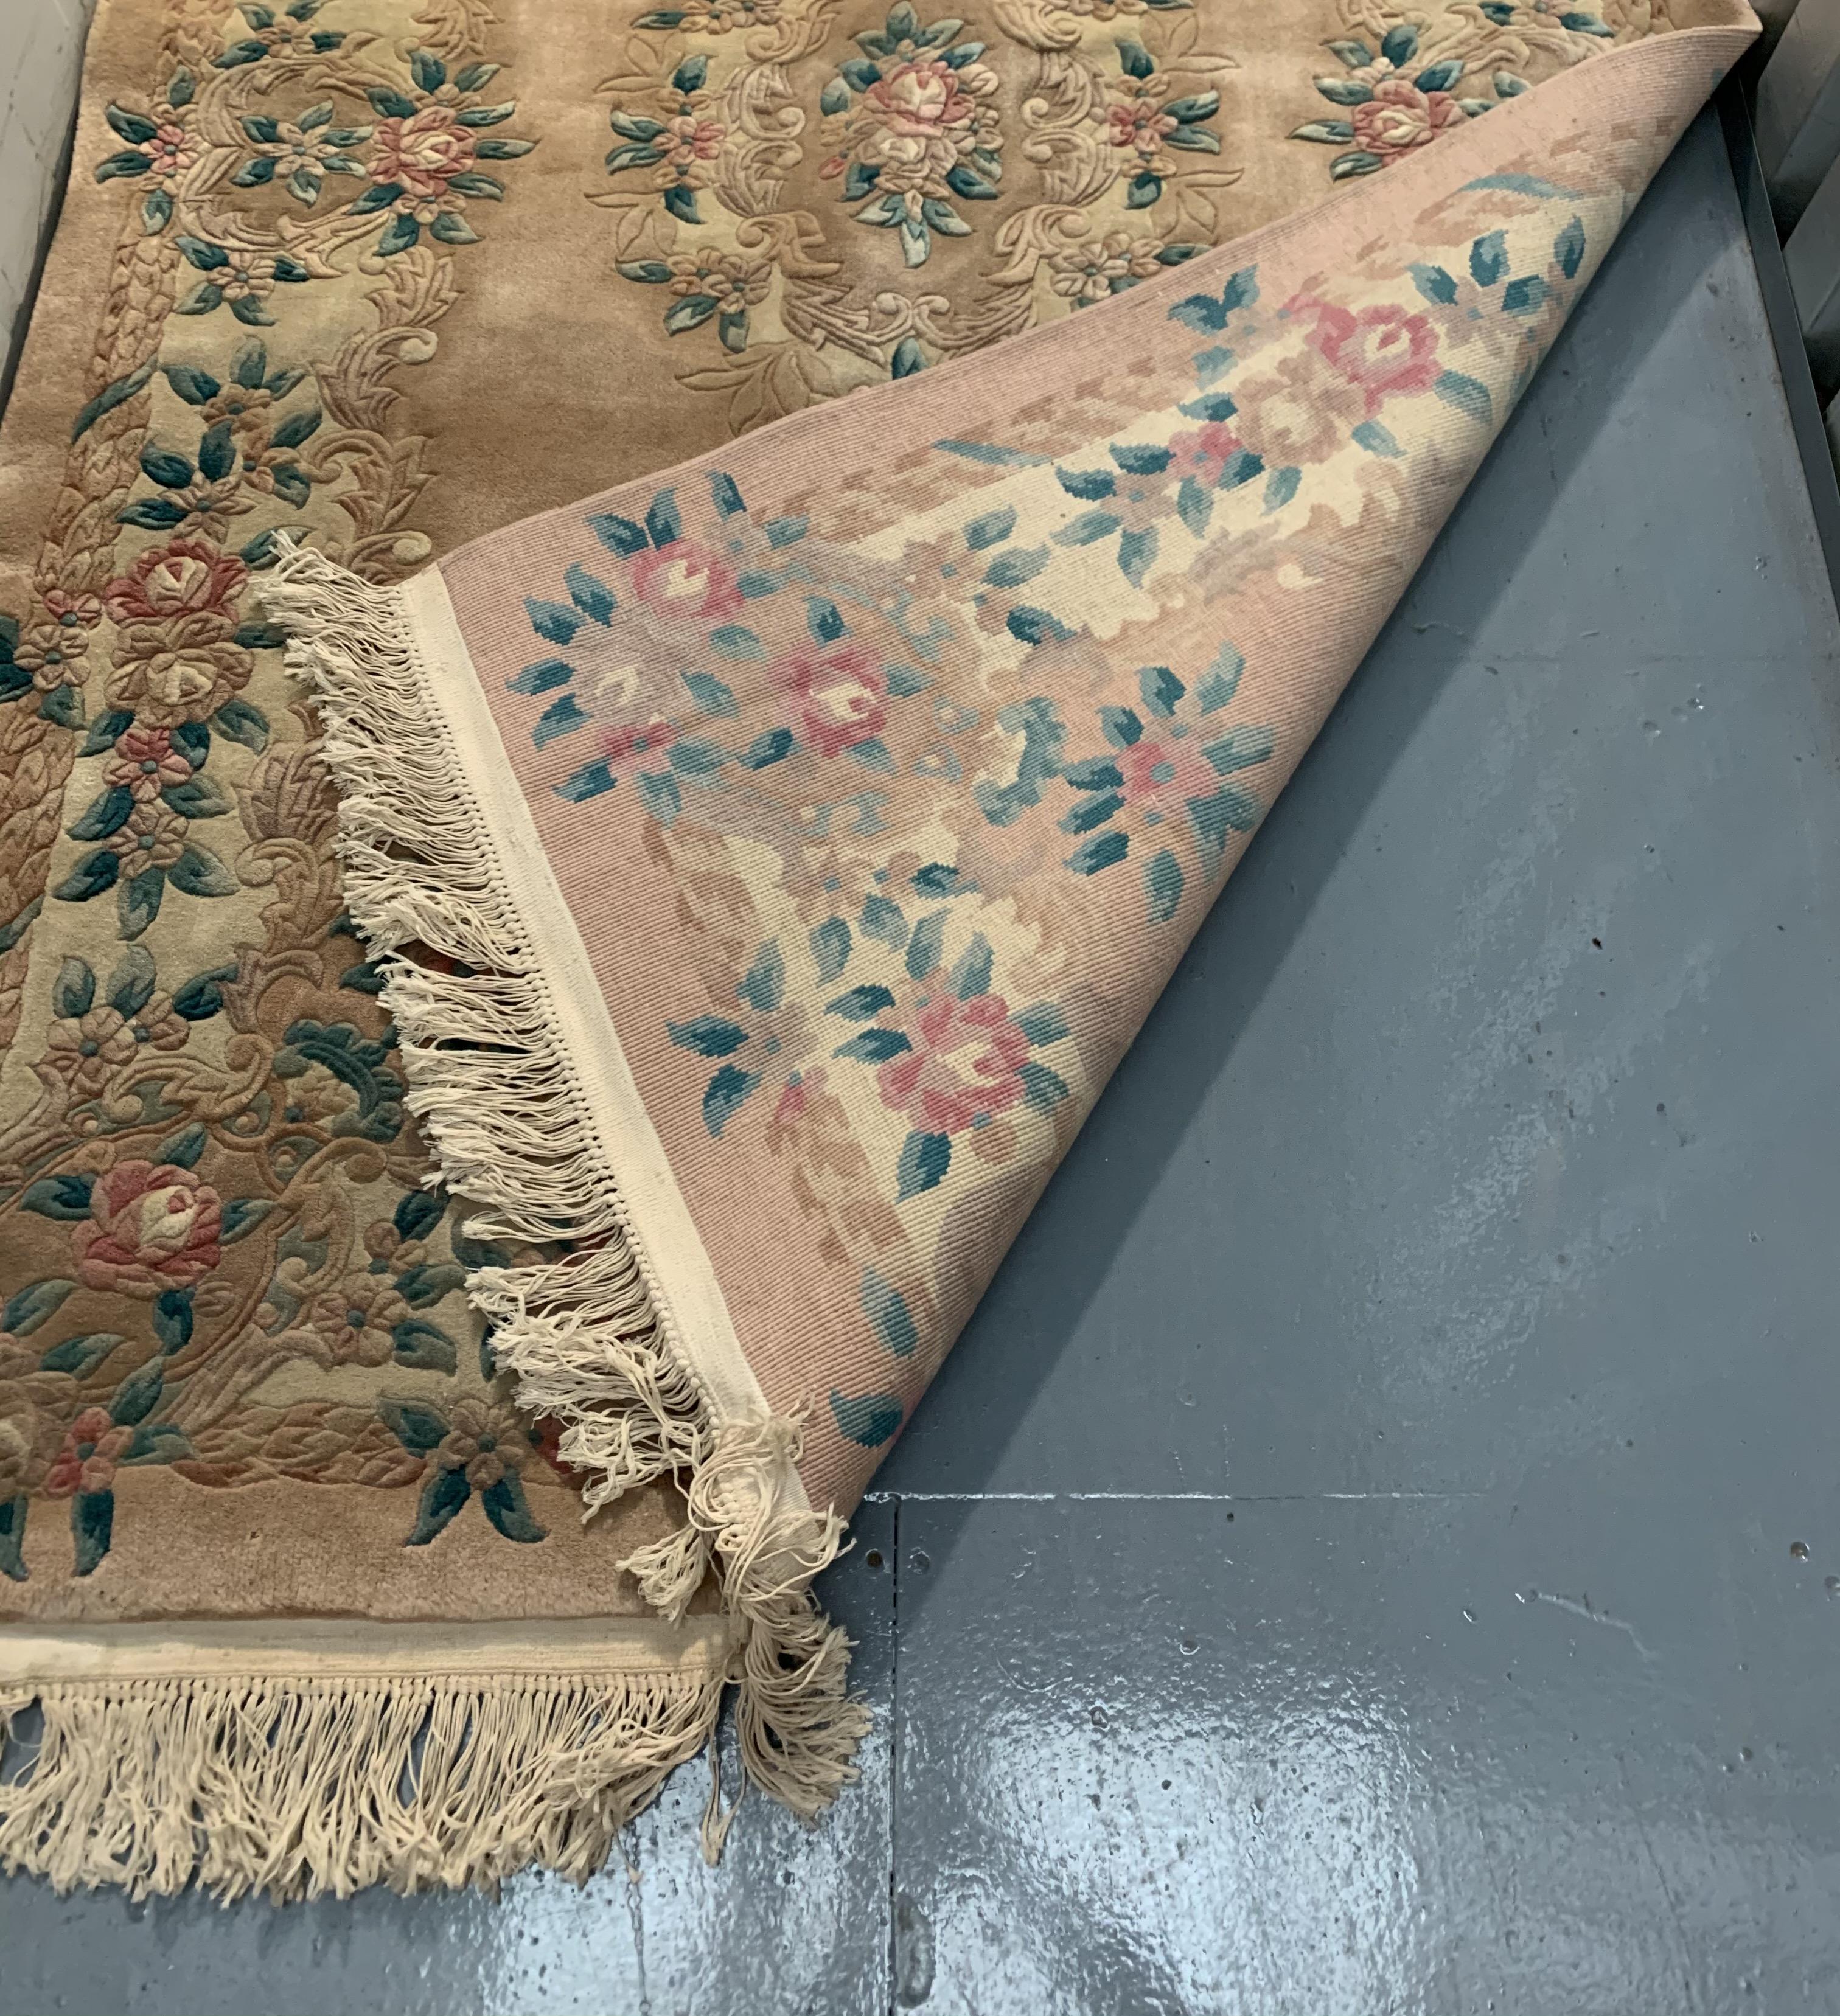 "Pink/beige/green flowered rug, 96"" long, 60"" wide - Image 3 of 3"